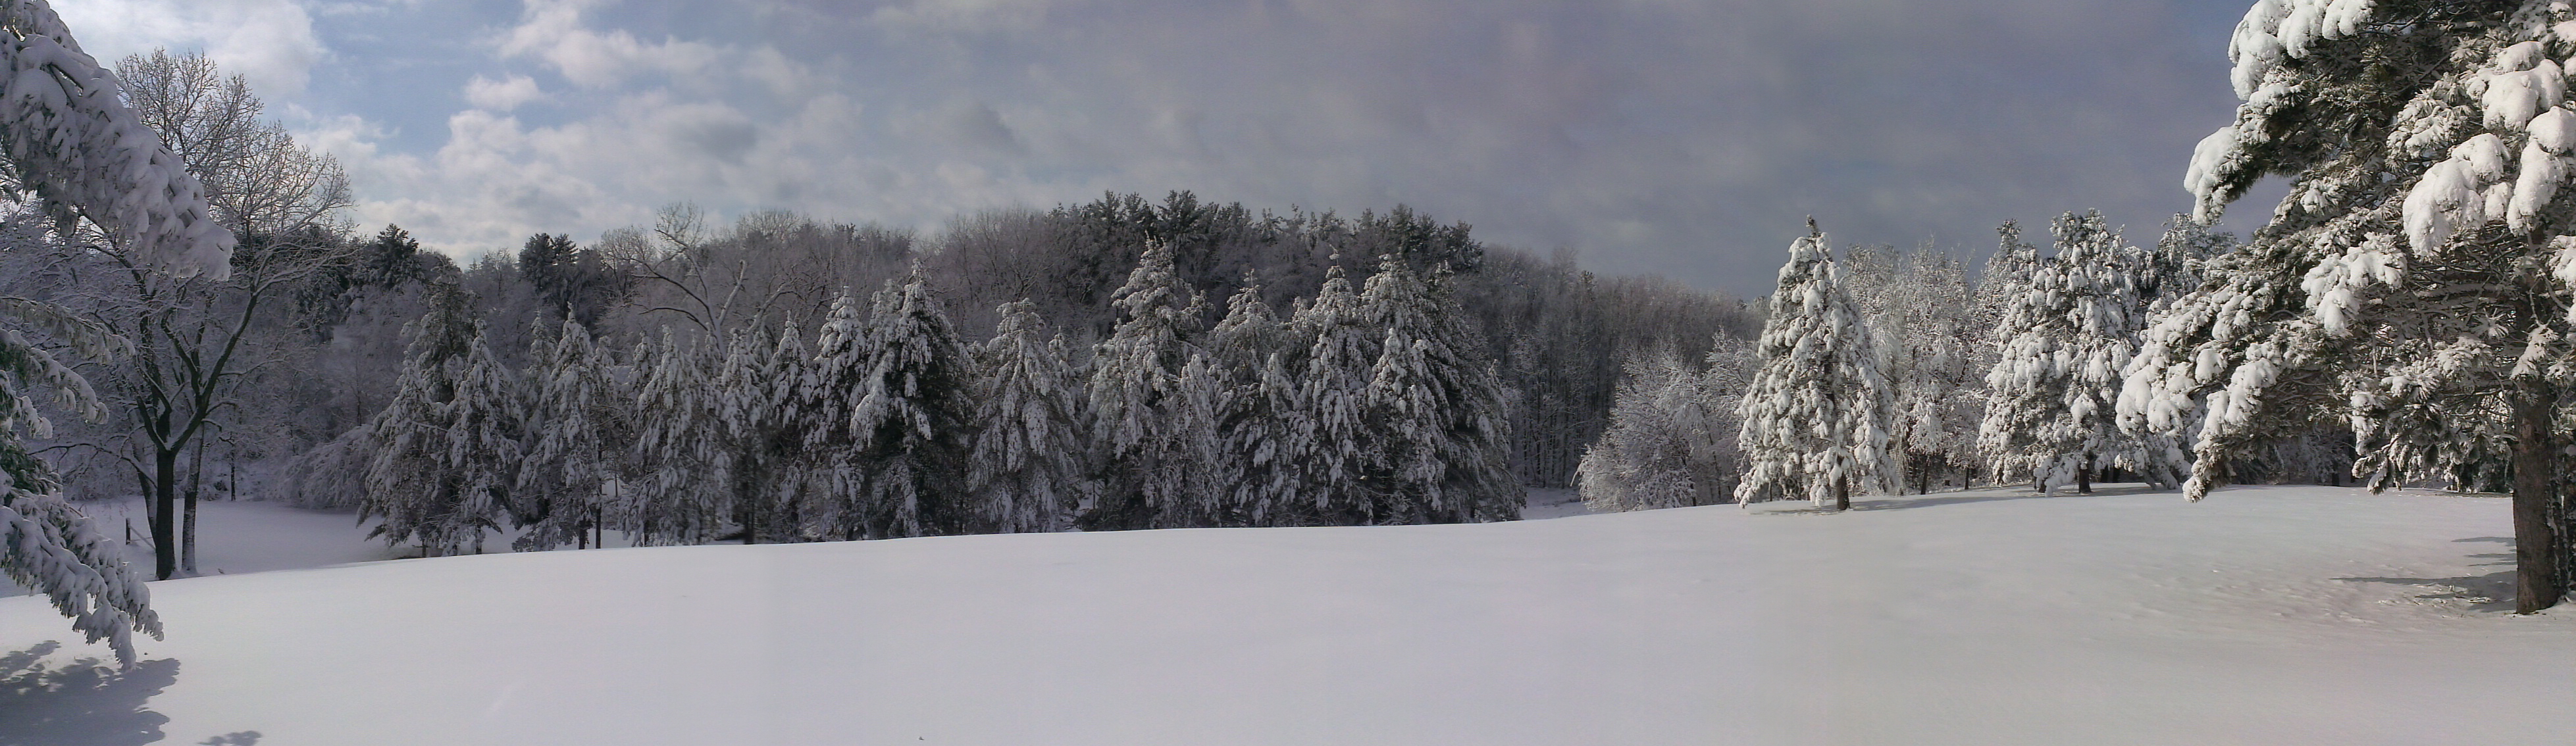 Westward Panorama-1